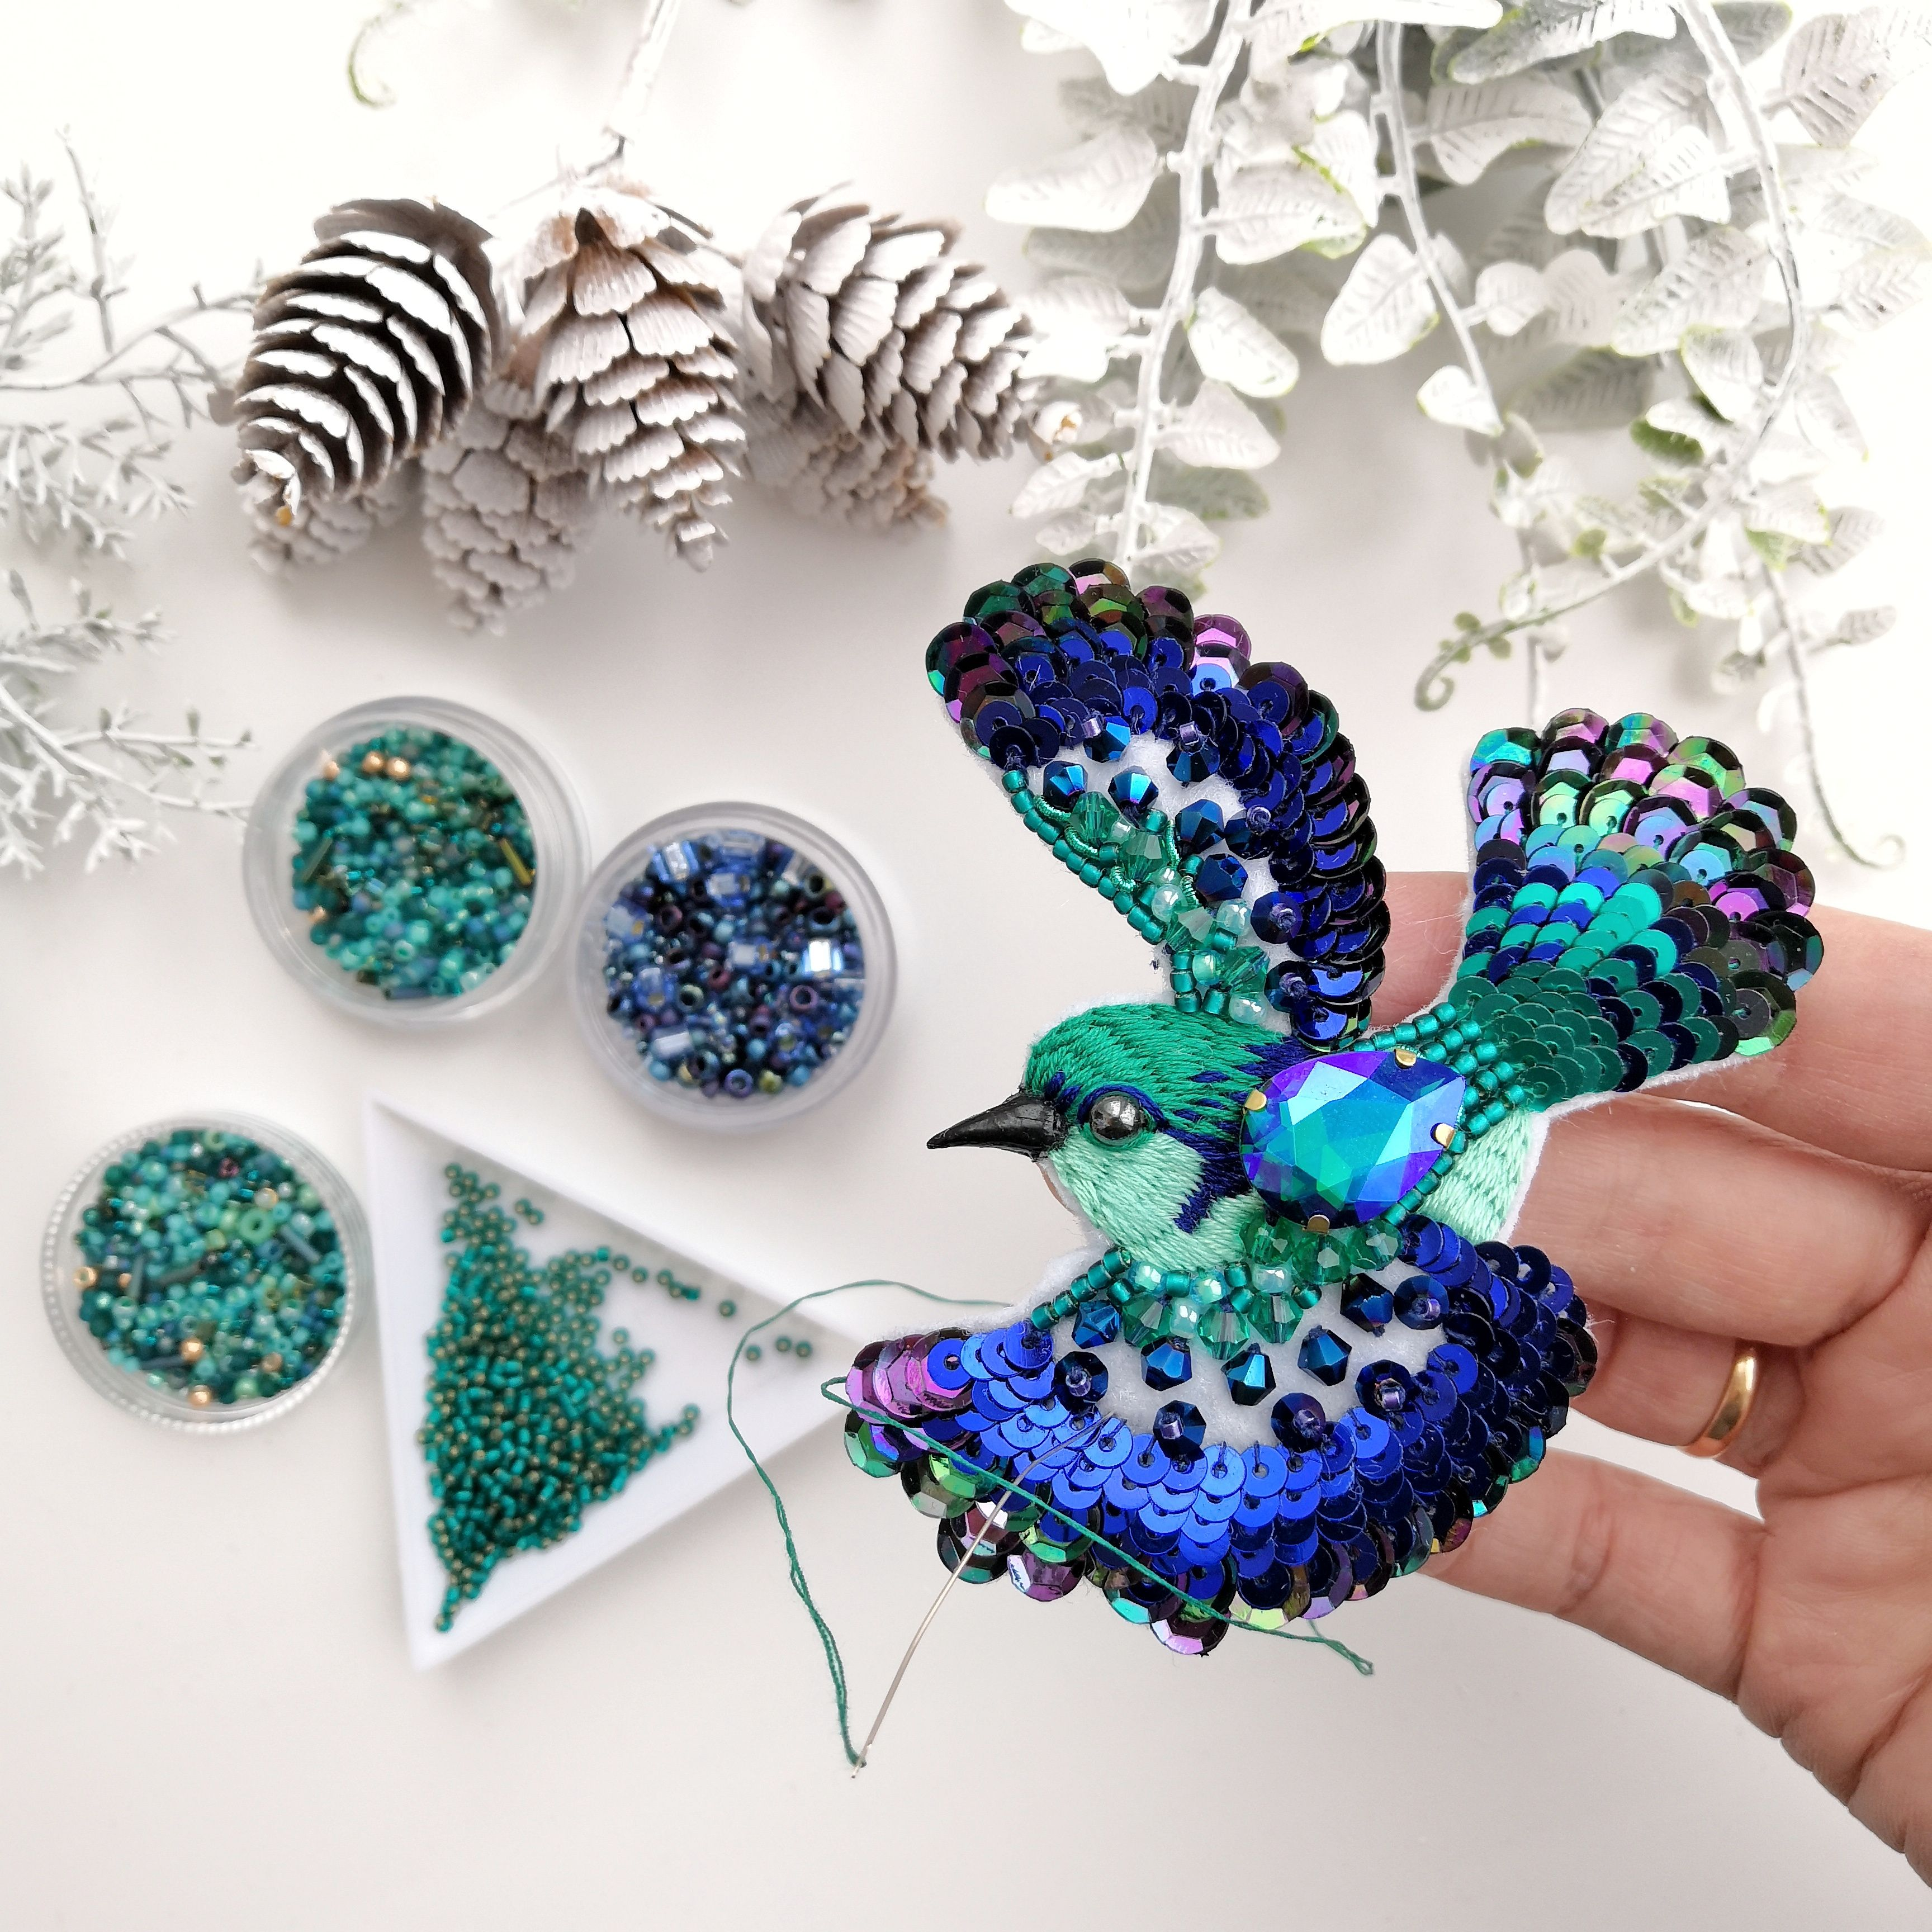 Bird brooch Textile jewelry Textile brooch Embroidered brooch Embroidered jewelry